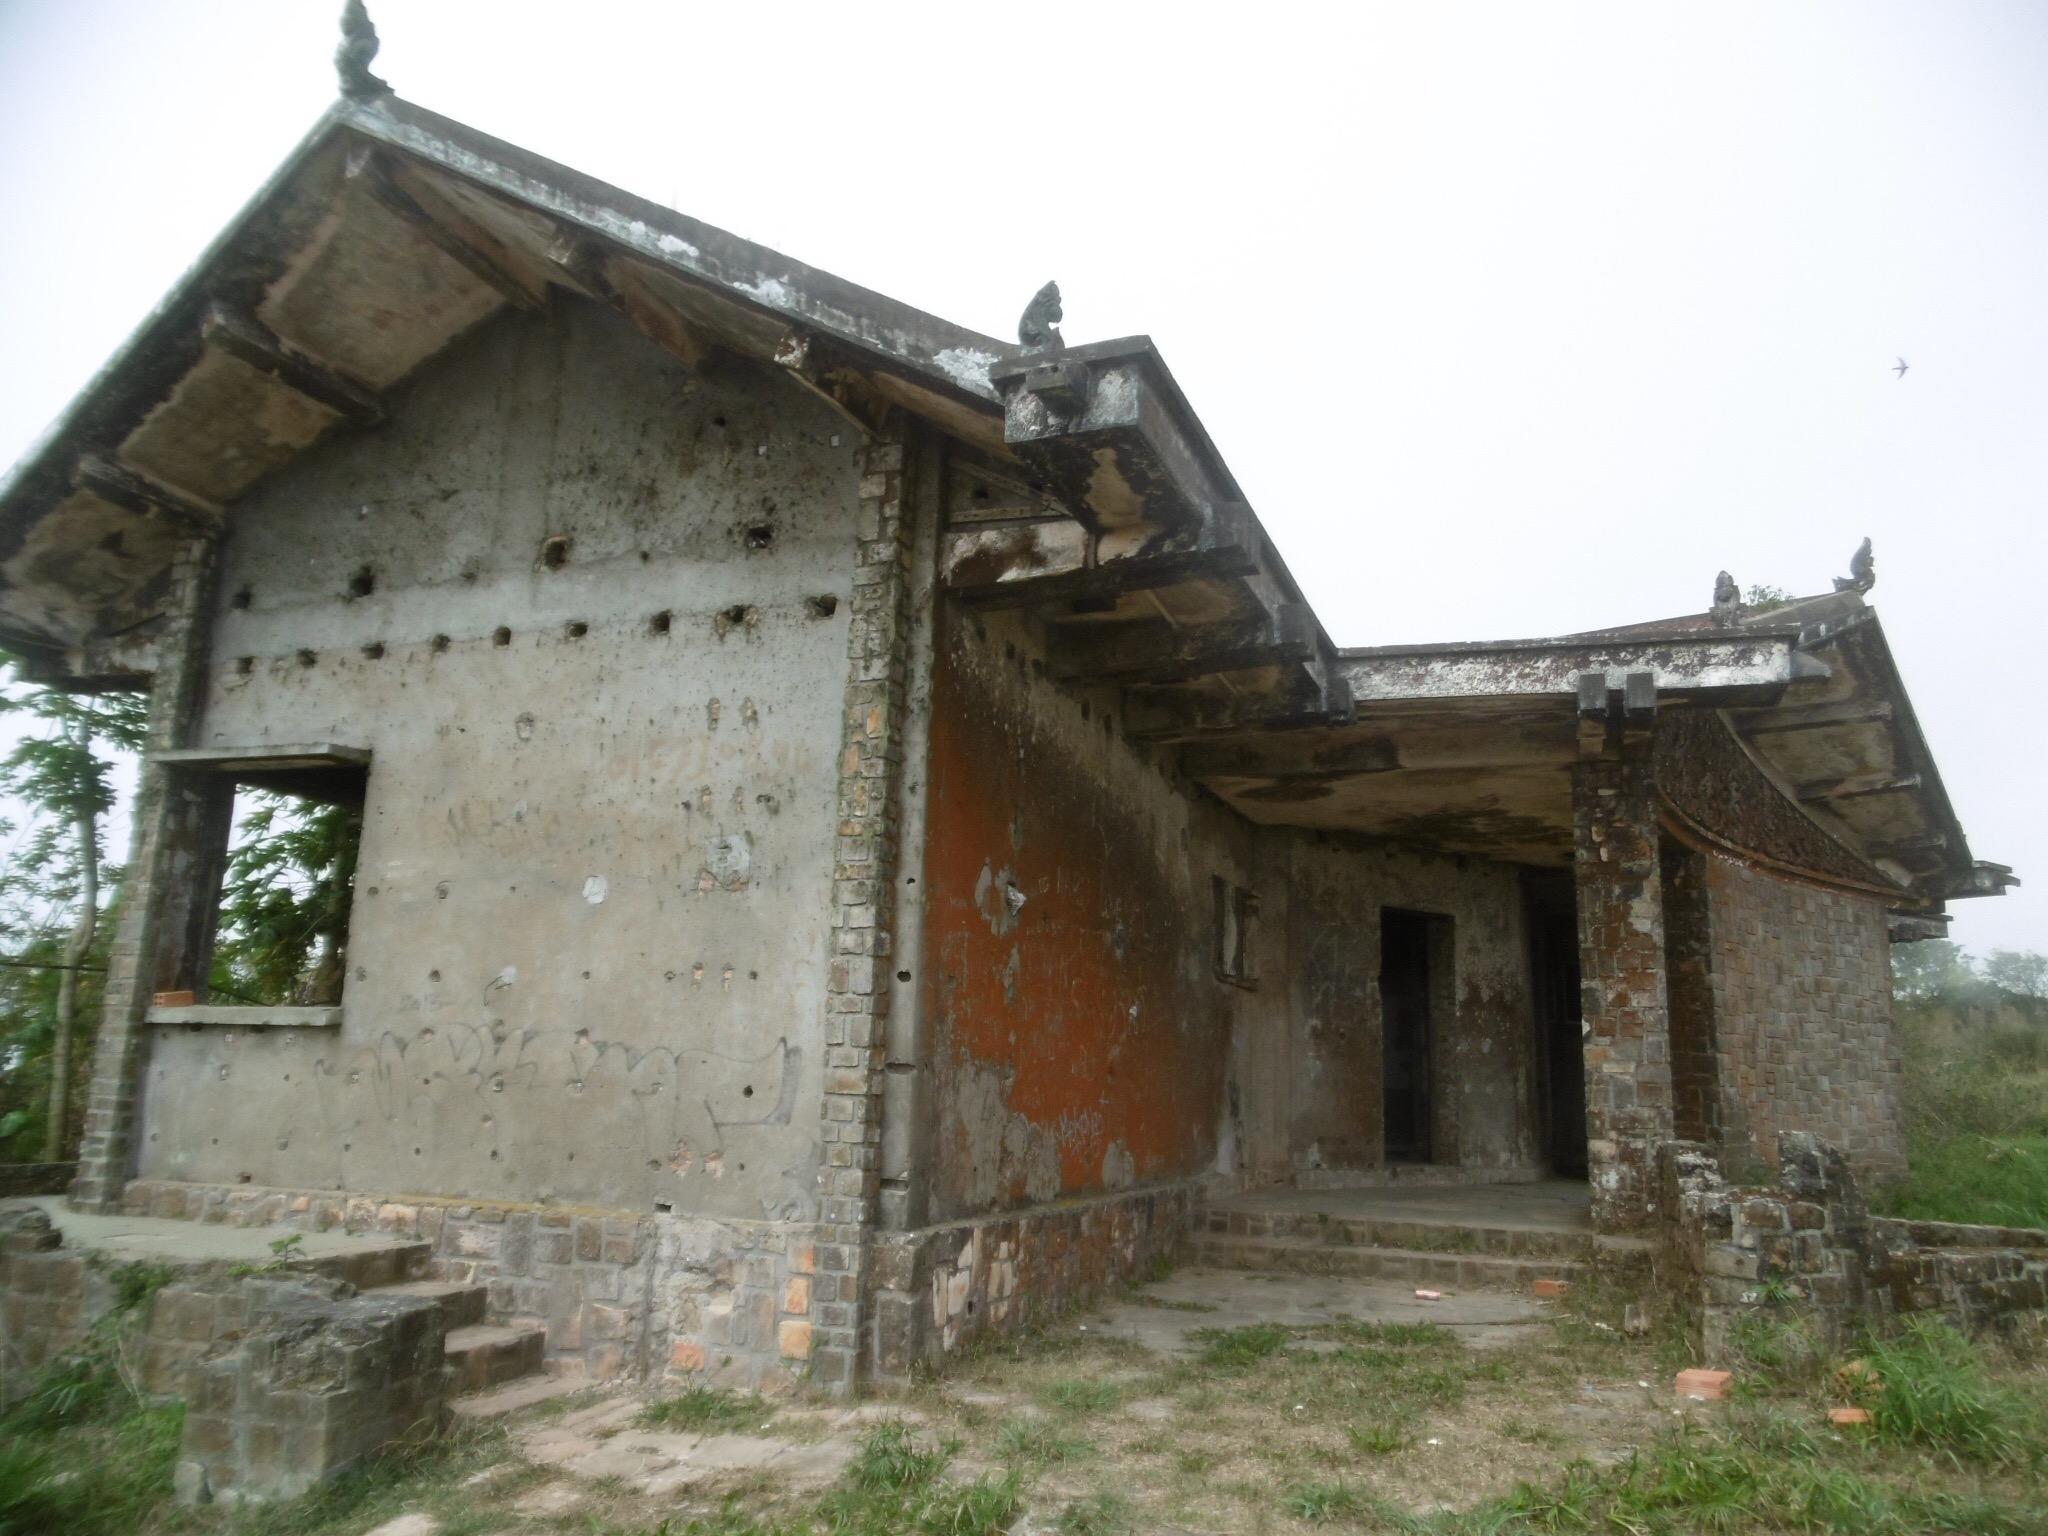 King Sihanouk's old summer house, Bokor National Park